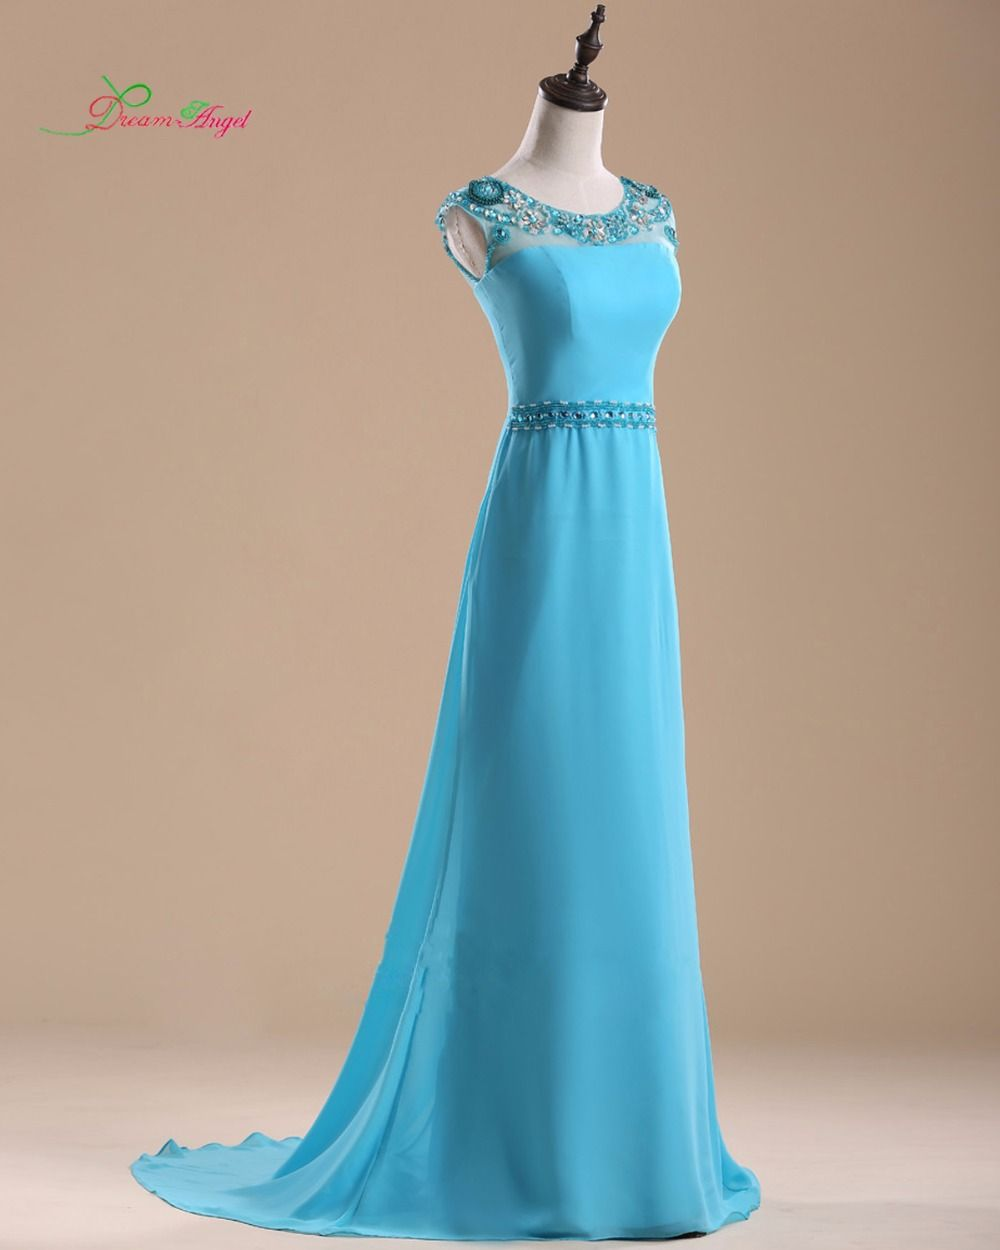 Dream angel elegant scoop neck long straight prom dress